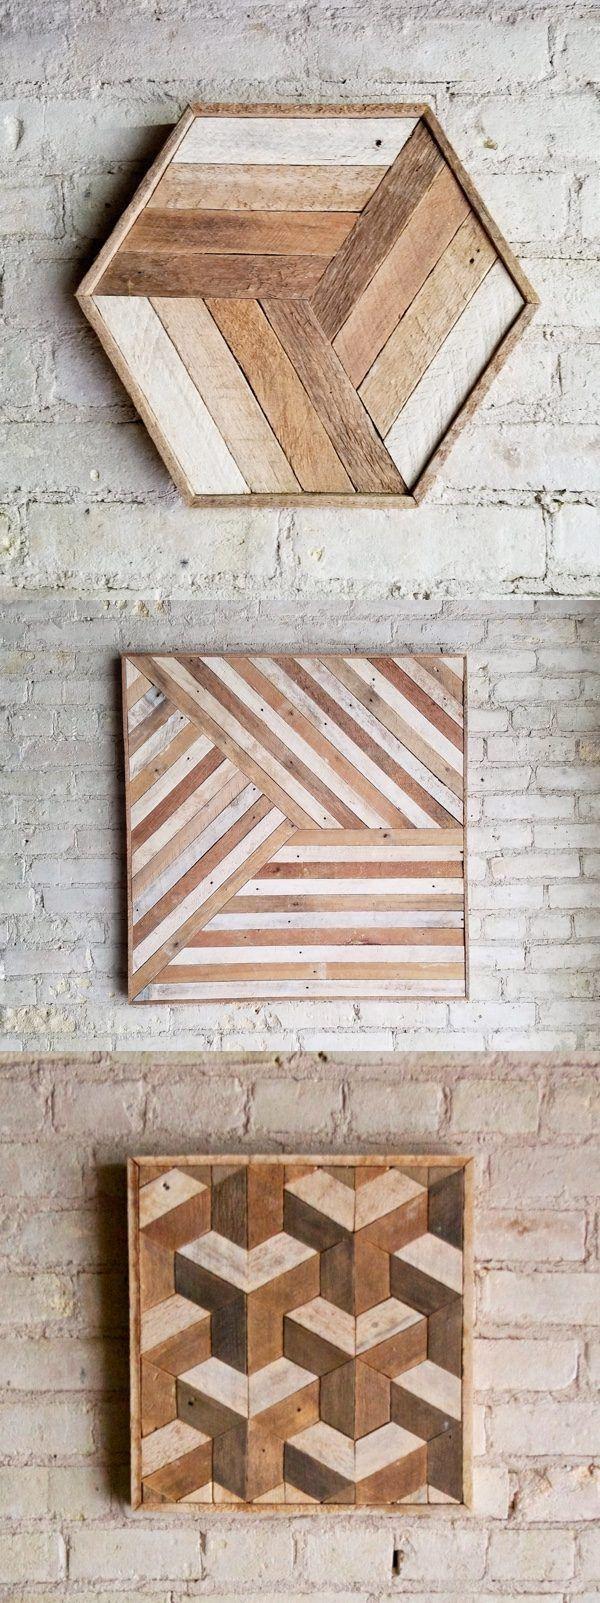 Best 25+ Wood Art Ideas On Pinterest | Decorative Shelves, Wood Inside Italian Inlaid Wood Wall Art (View 14 of 20)